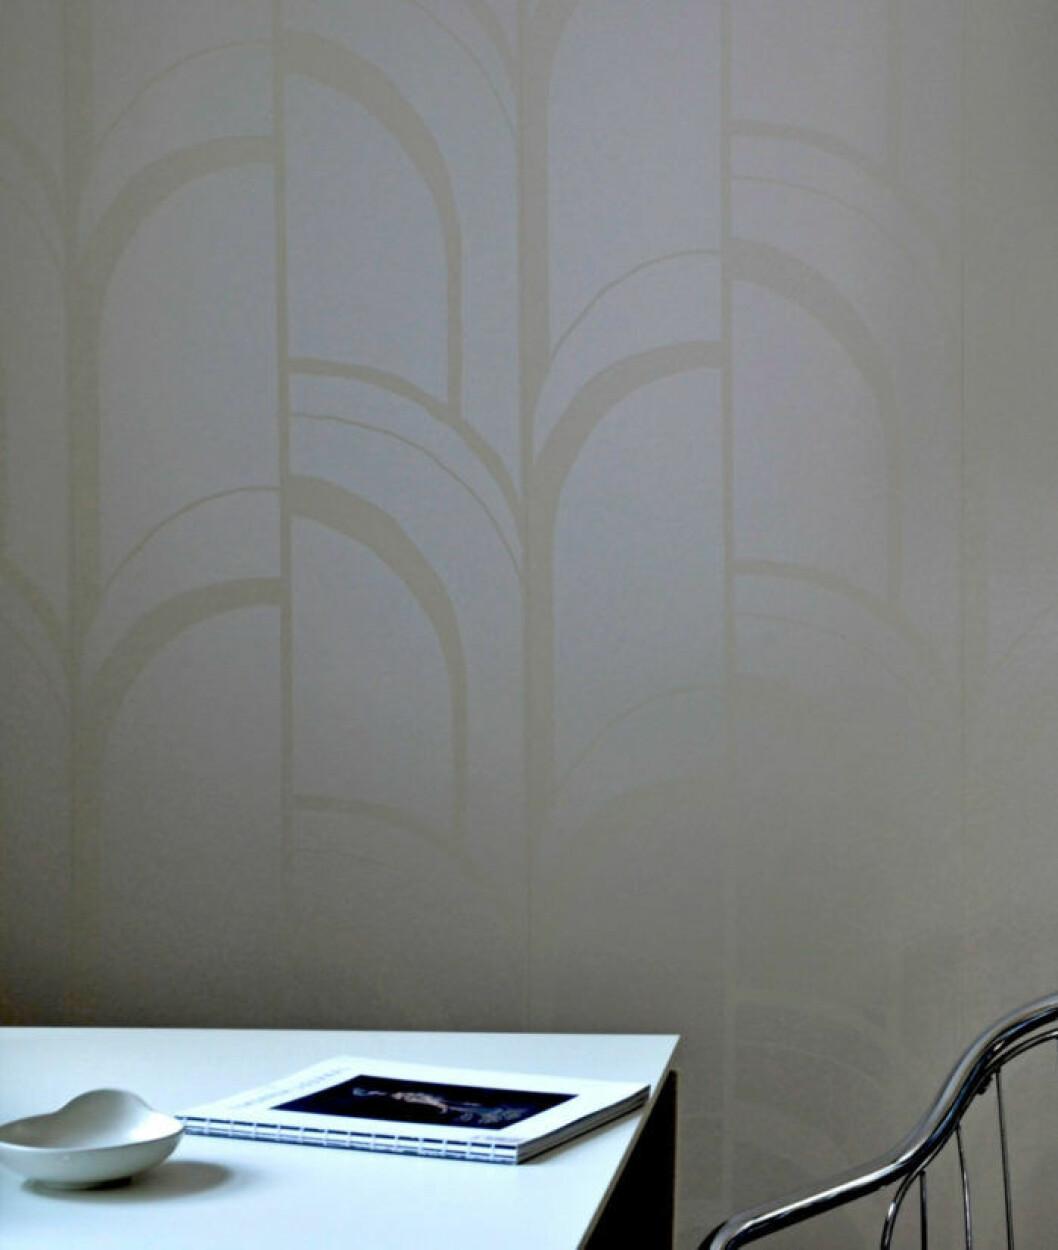 Tapet Reflections från Mimou, design Malin Karstensson